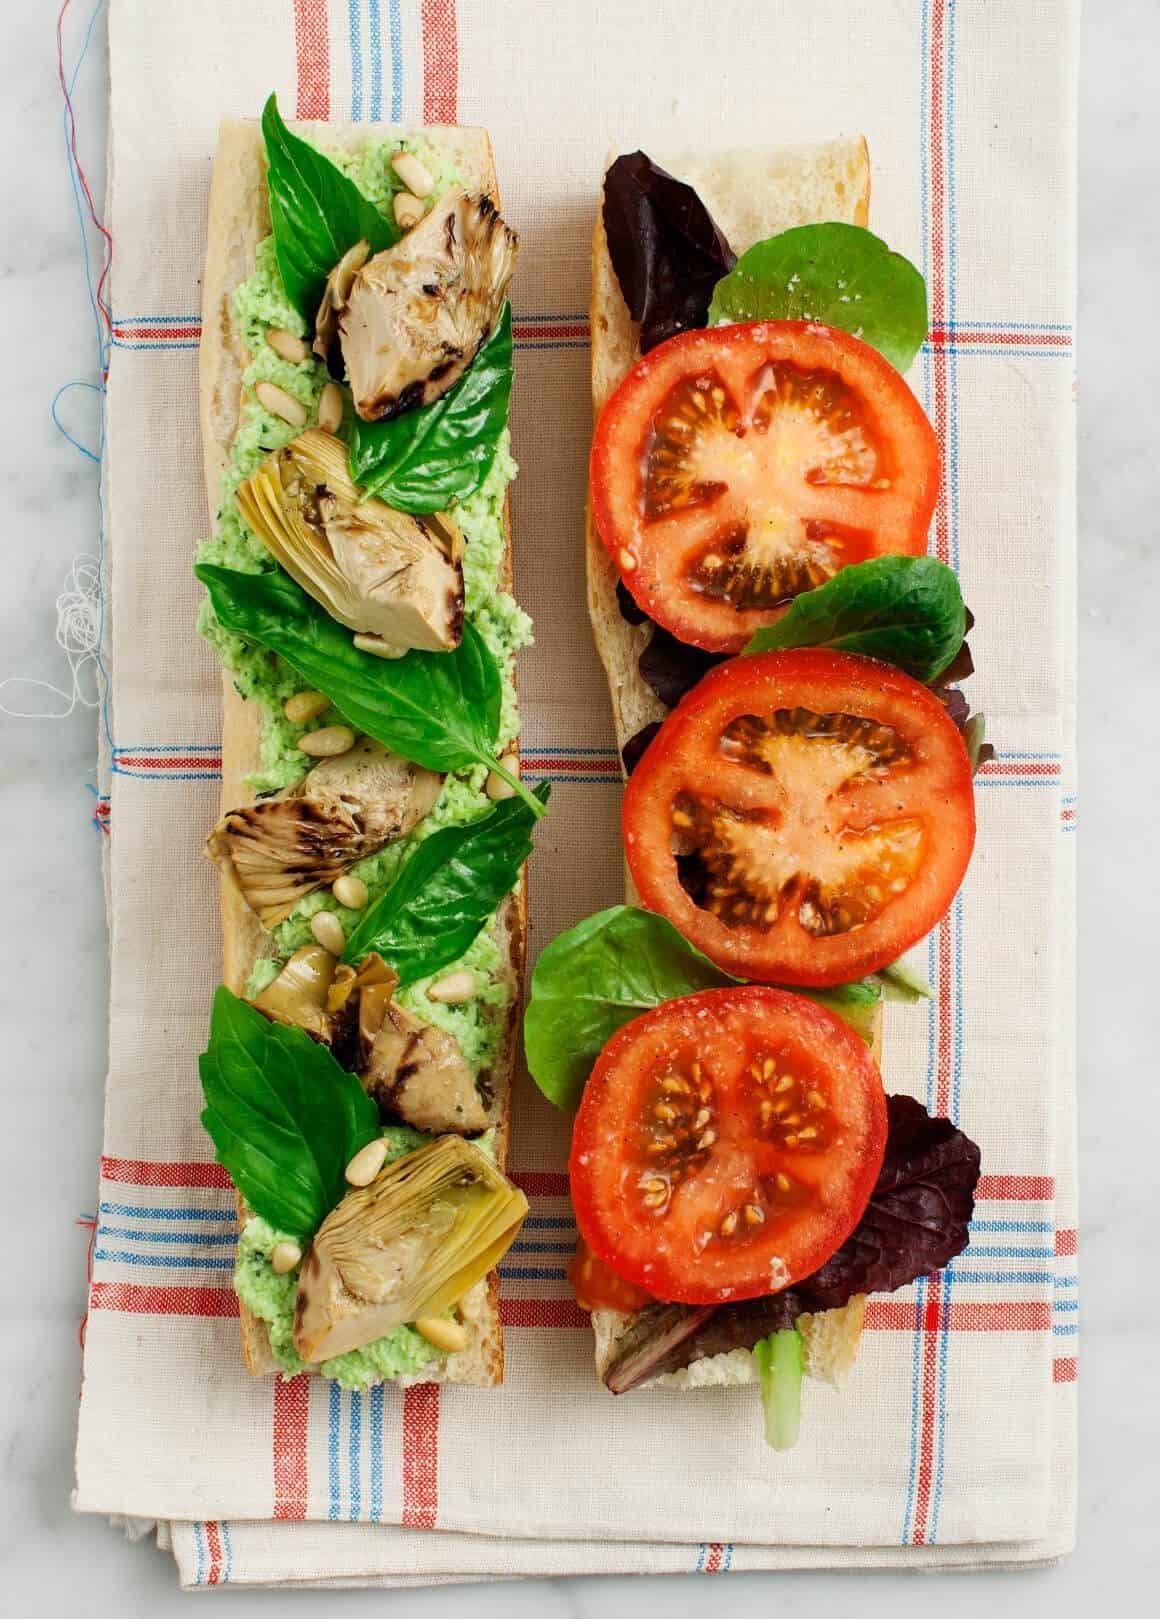 Tomato Basil Artichoke Picnic Sandwich